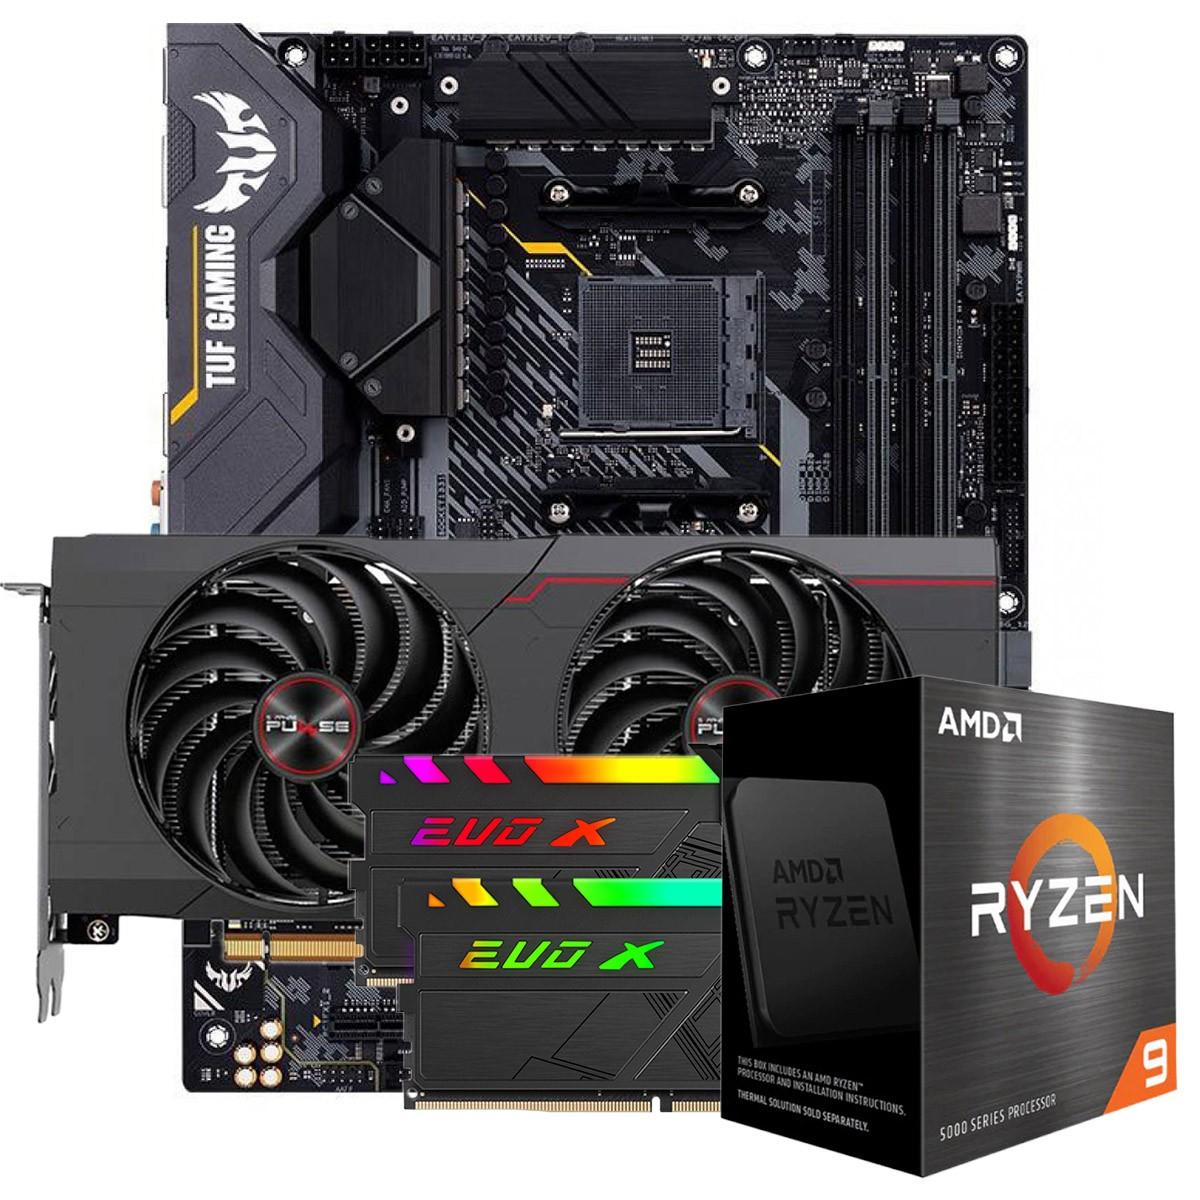 Kit Upgrade Sapphire Pulse Radeon RX 6700 XT + AMD Ryzen 9 5950X + ASUS TUF Gaming X570-Plus + Memória DDR4 16GB (2x8GB) 3600MHz